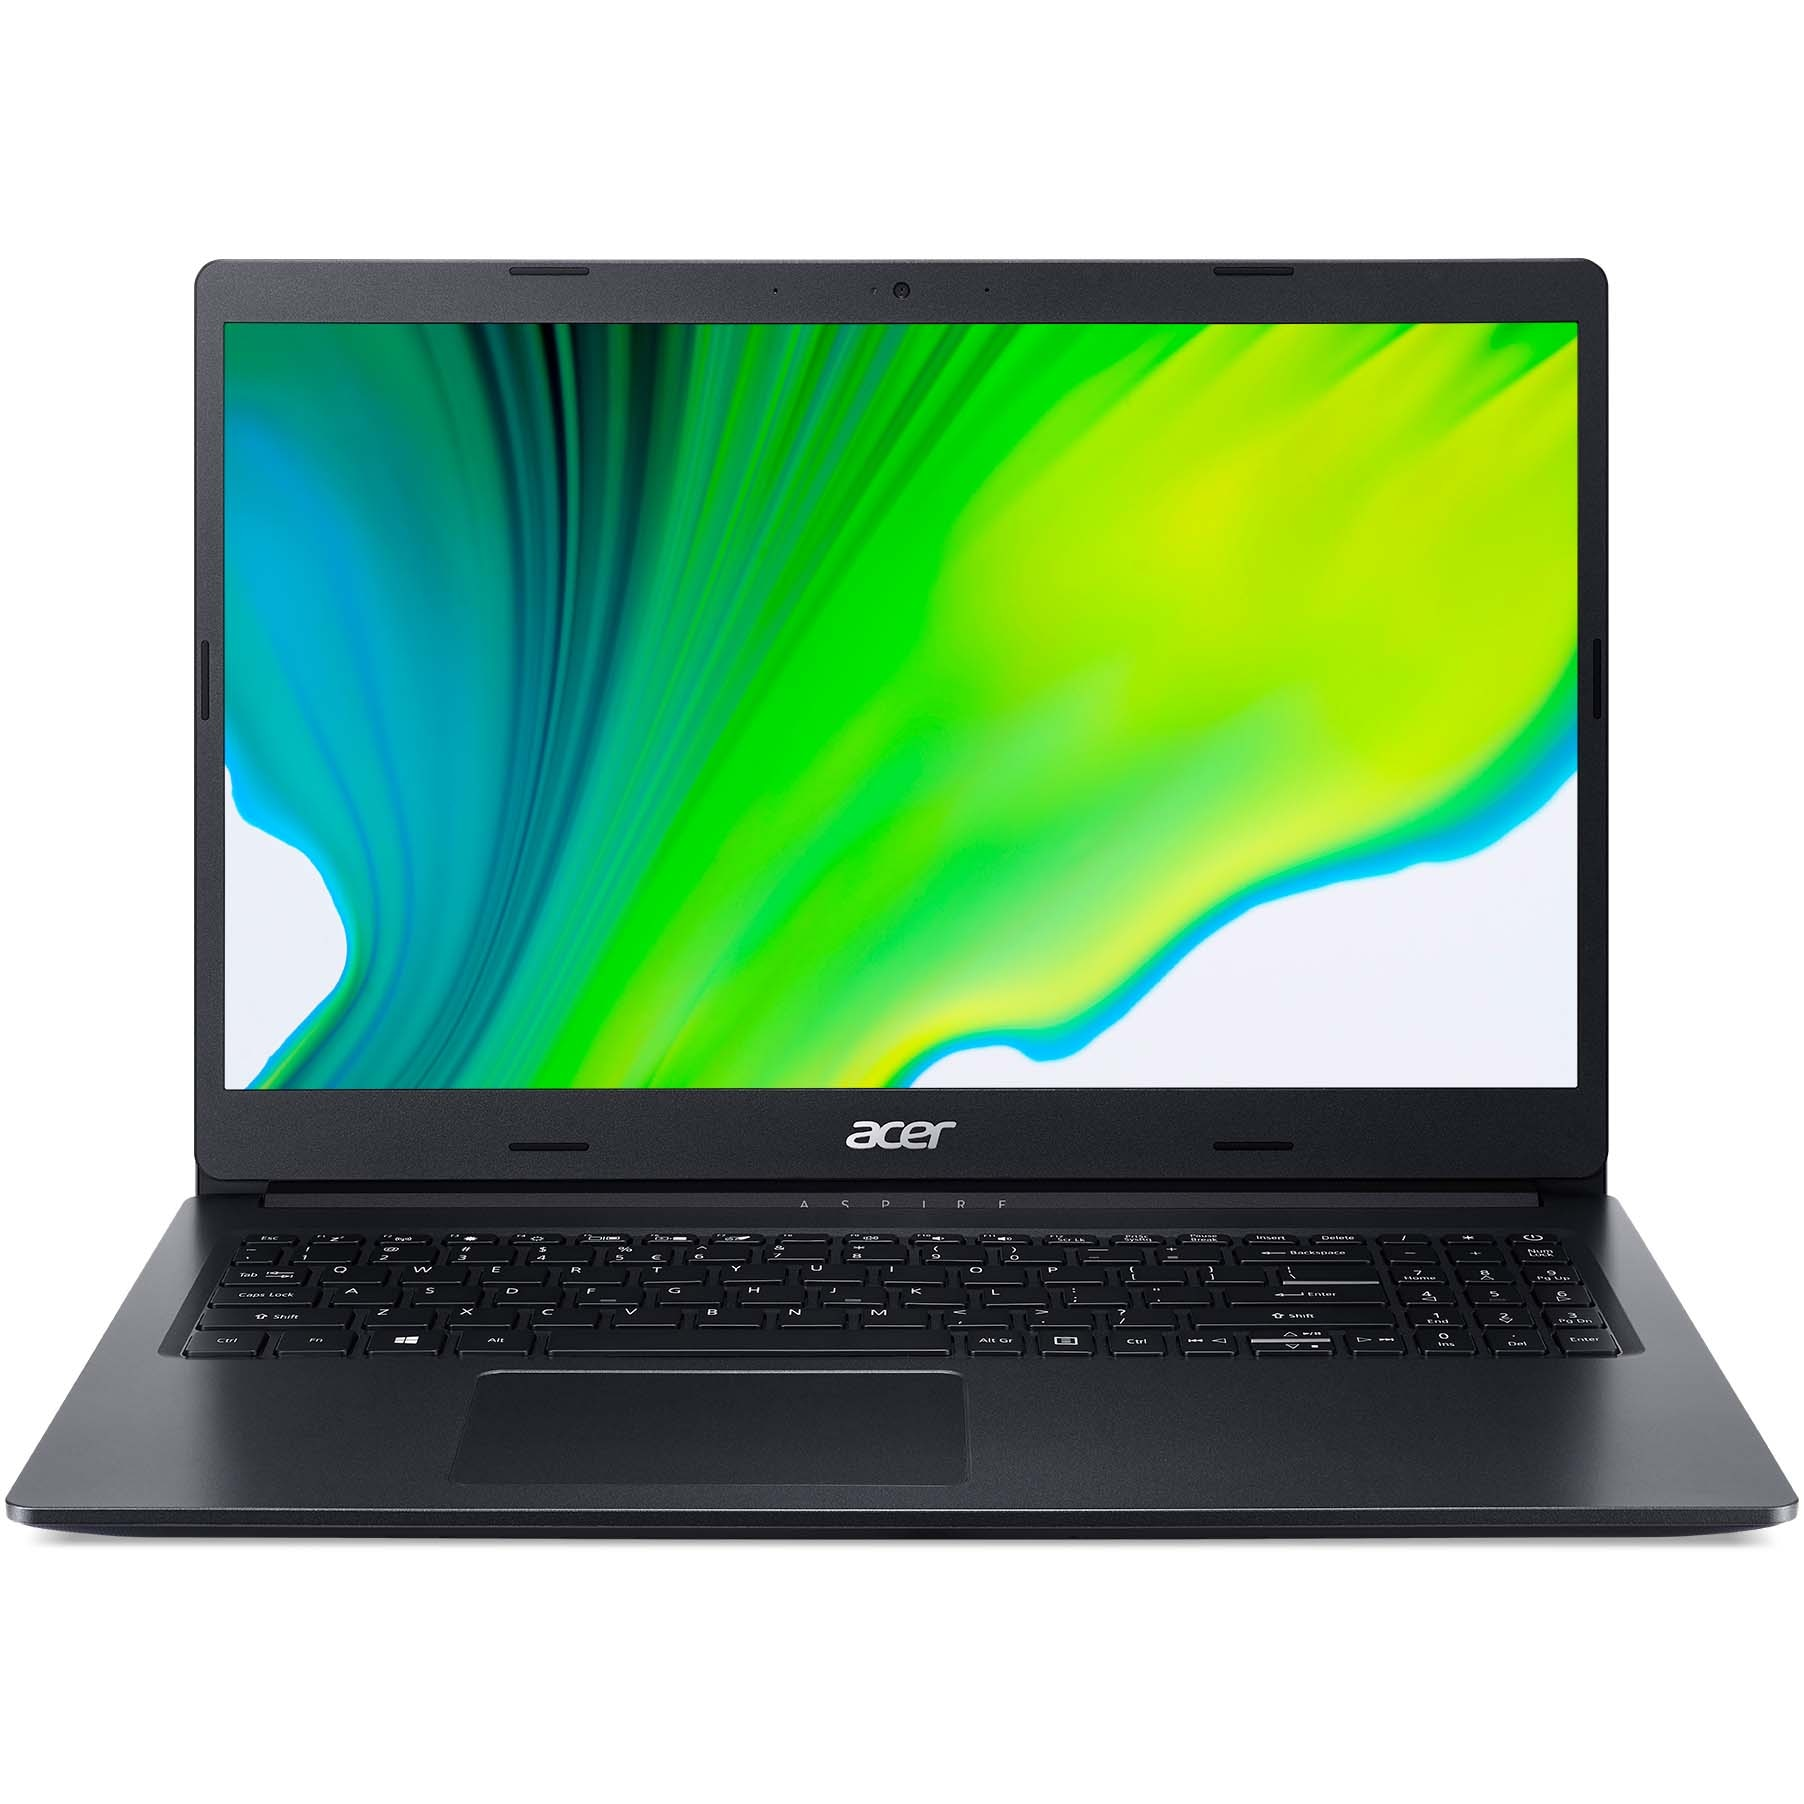 "Fotografie Laptop Acer Aspire 3 A315-23G cu procesor AMD Ryzen 5 3500U pana la 3.70 GHz, 15.6"", Full HD, 8GB, 256GB SSD, AMD Radeon™ 625 2GB, No OS, Black"